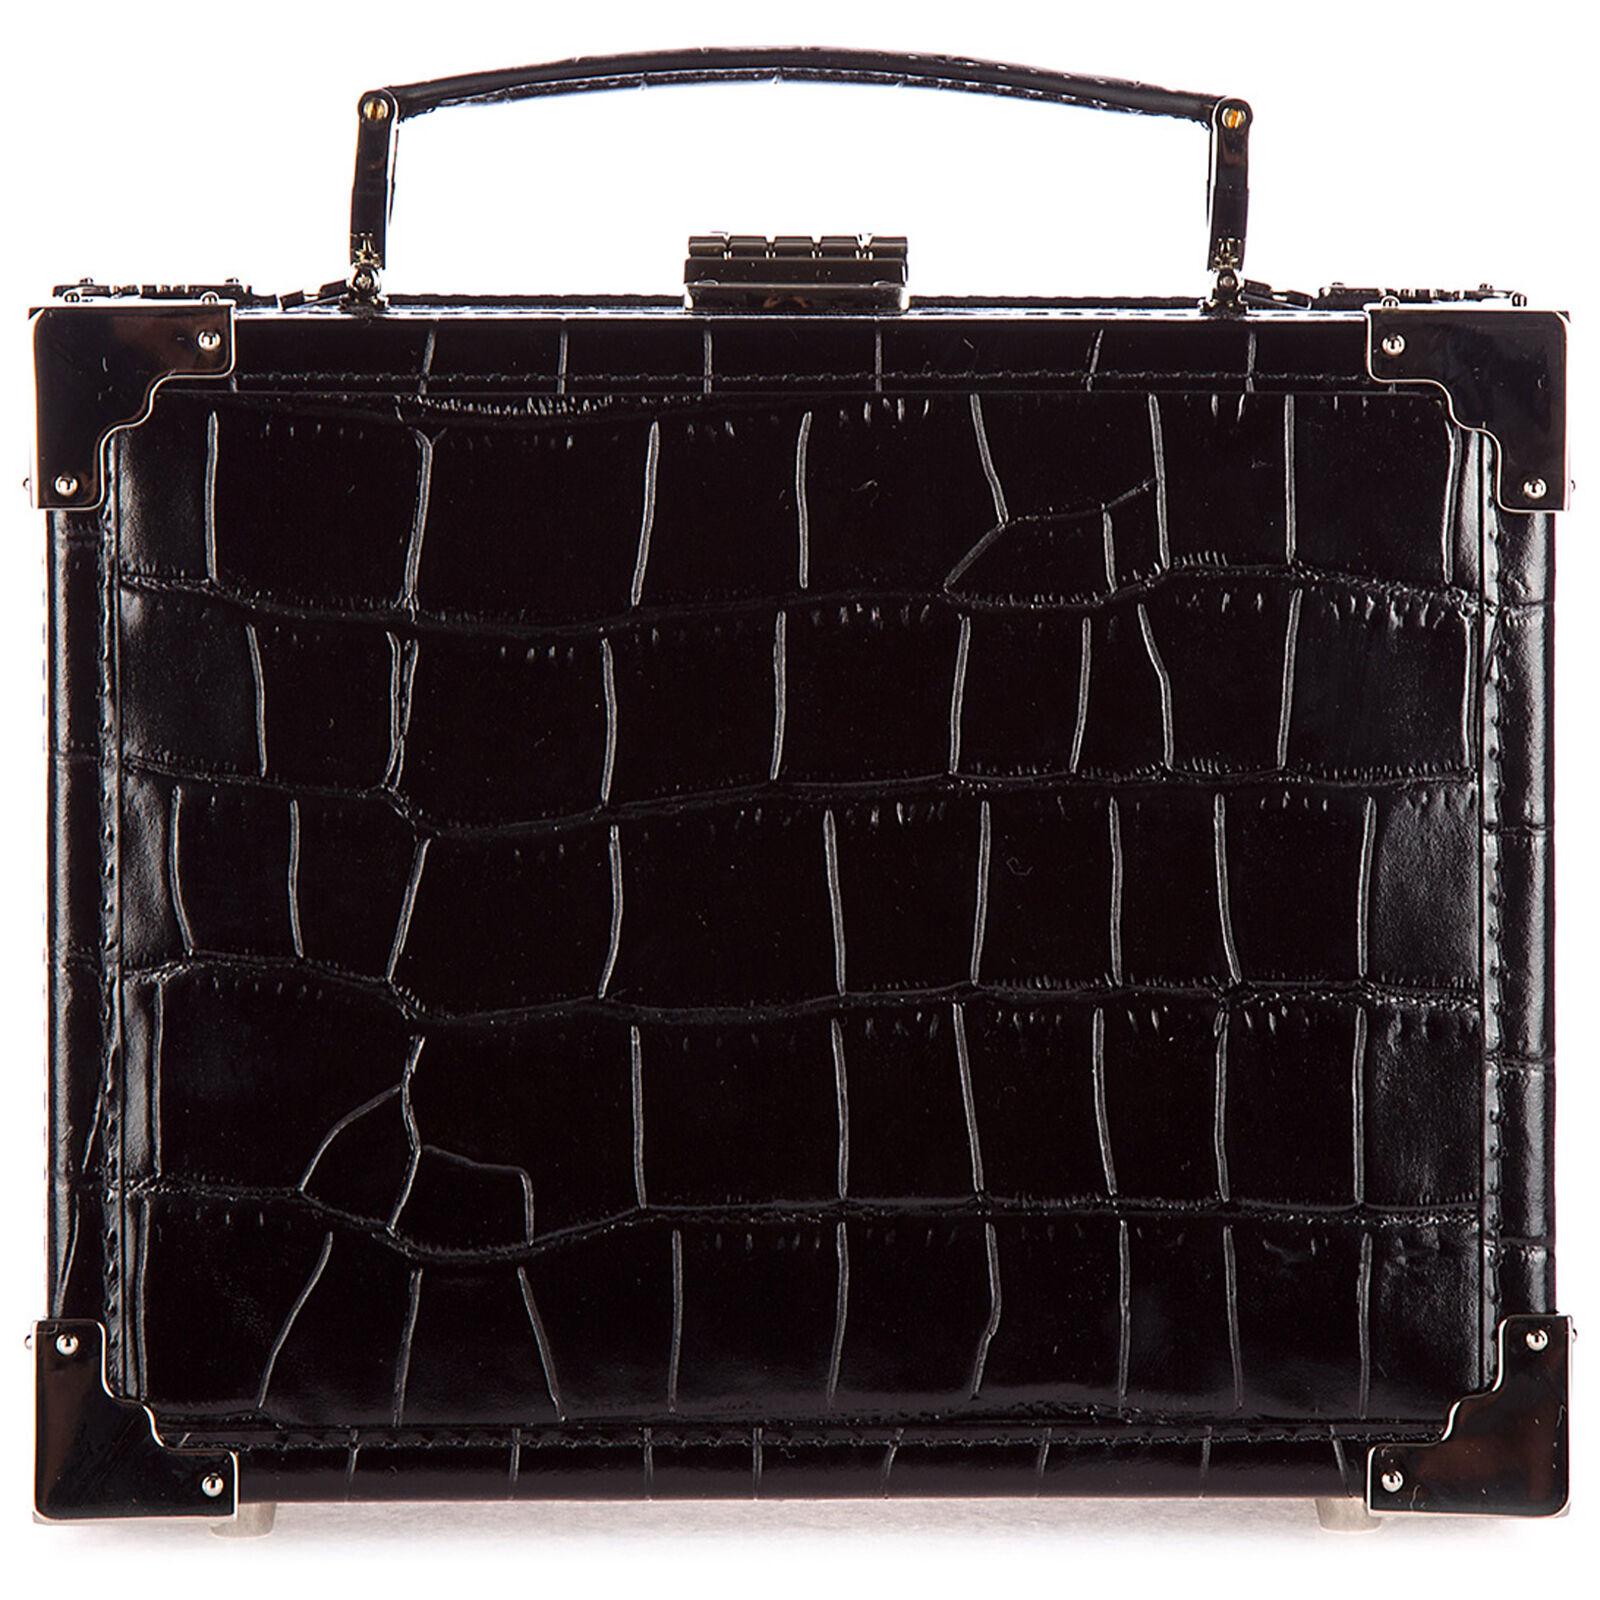 Aspinal of London Women's leather clutch handbag bag purse trunk  - Black